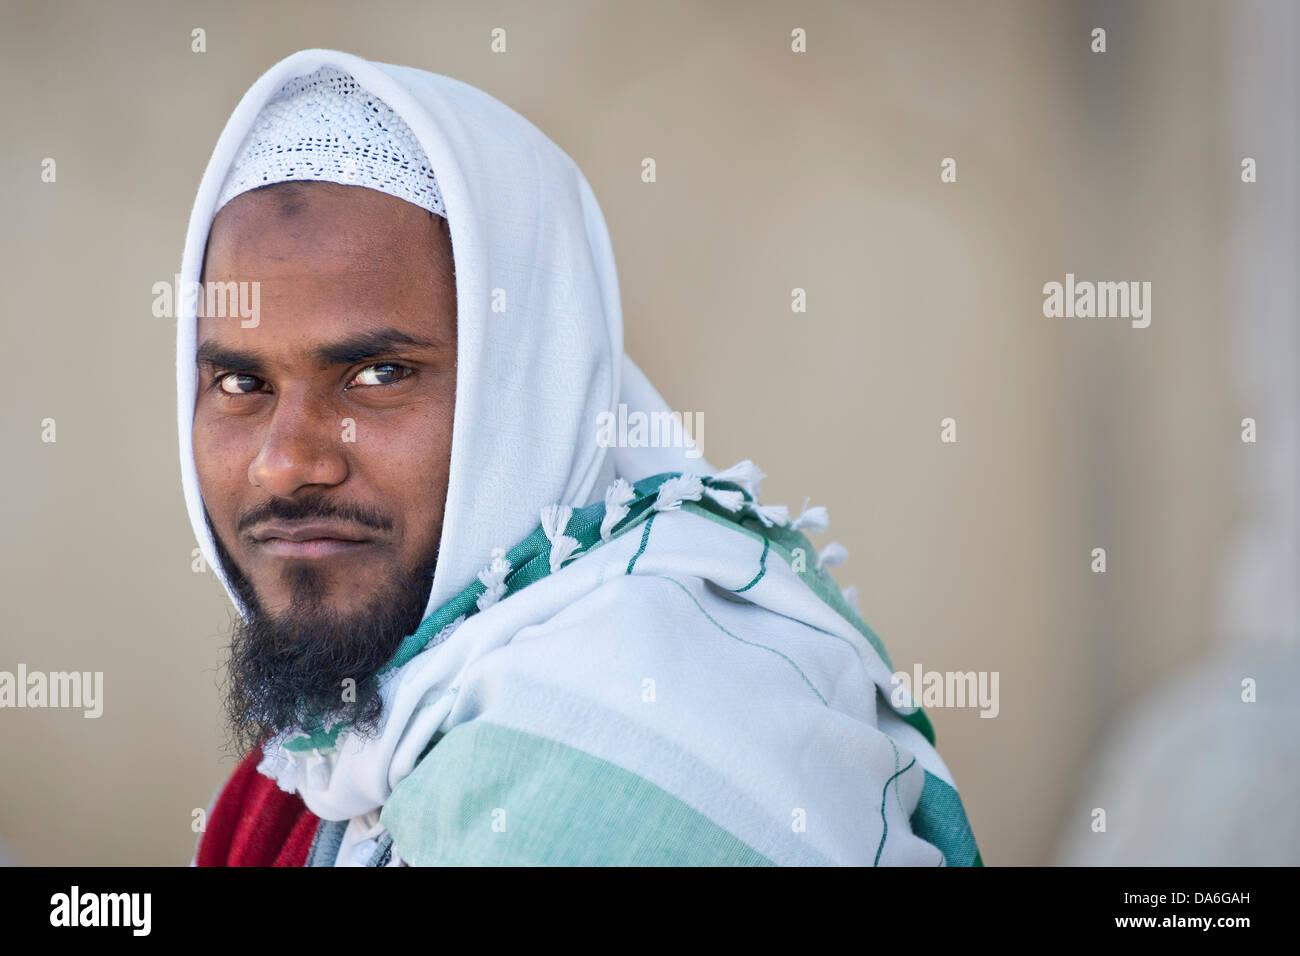 Männer islam kopfbedeckungen Tuareg